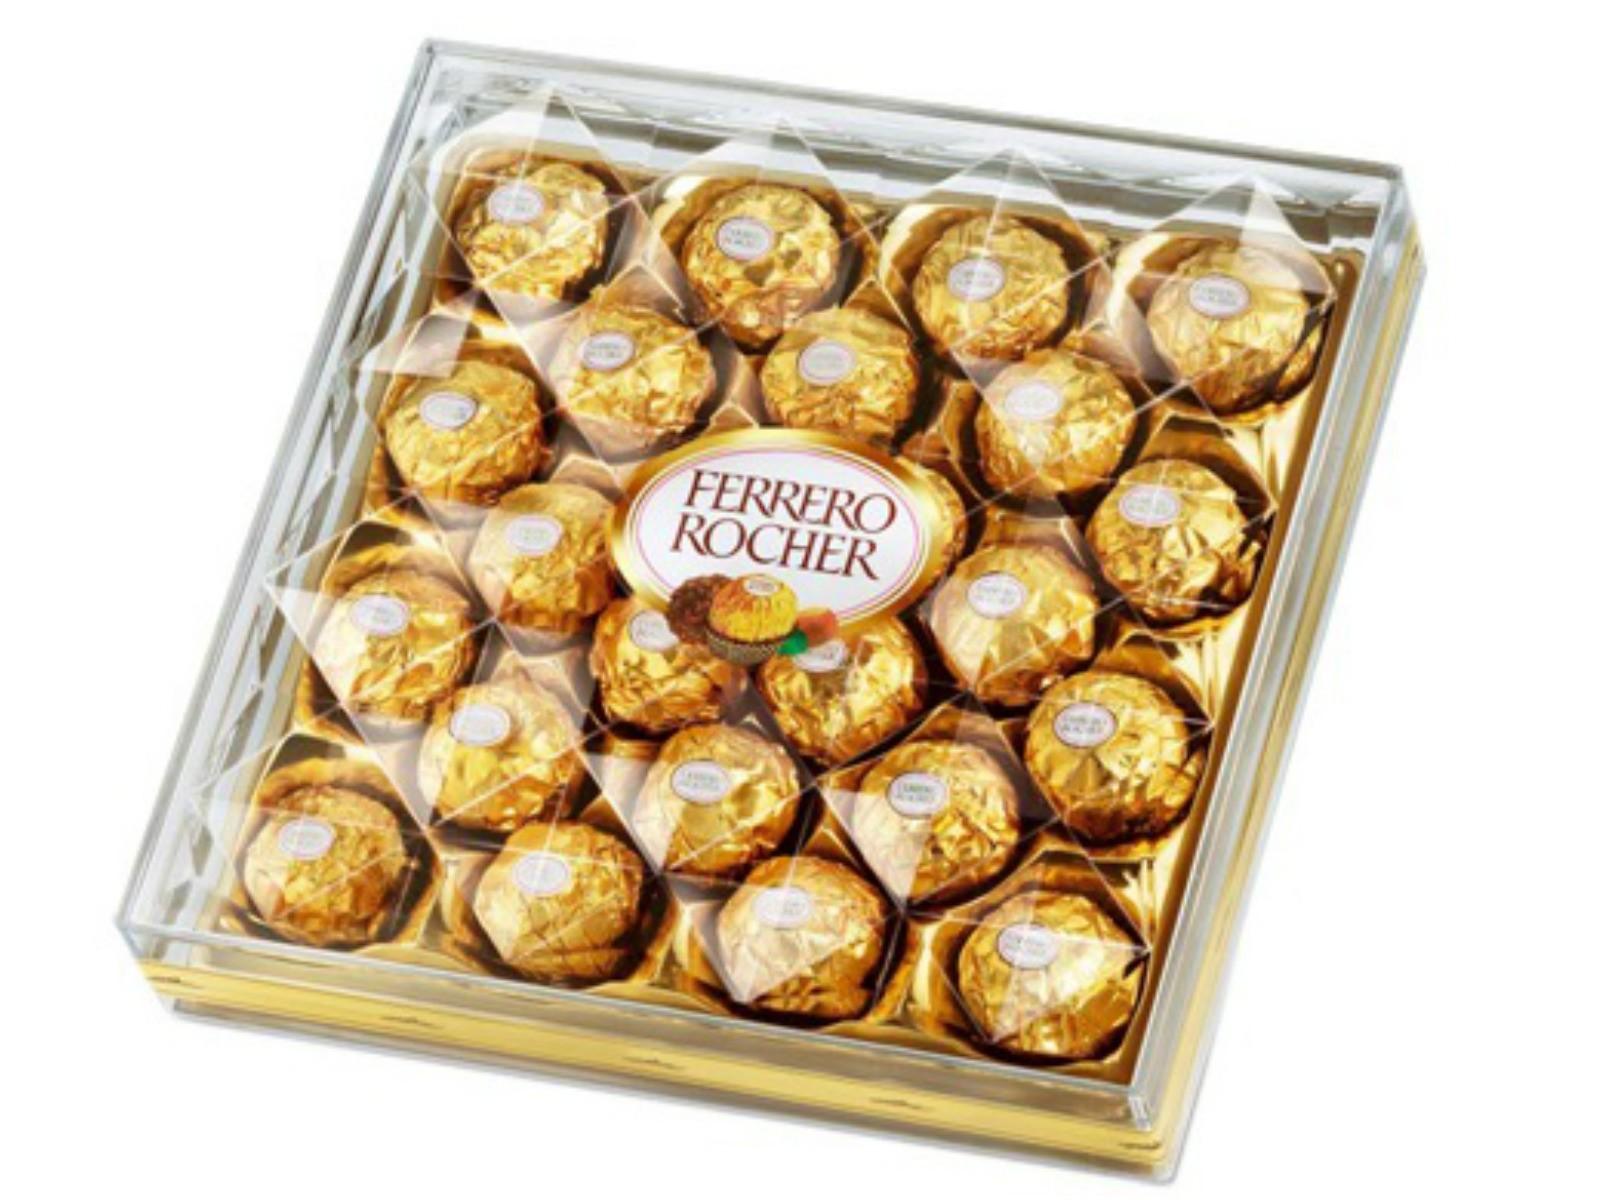 24 pieces Ferrero Rocher